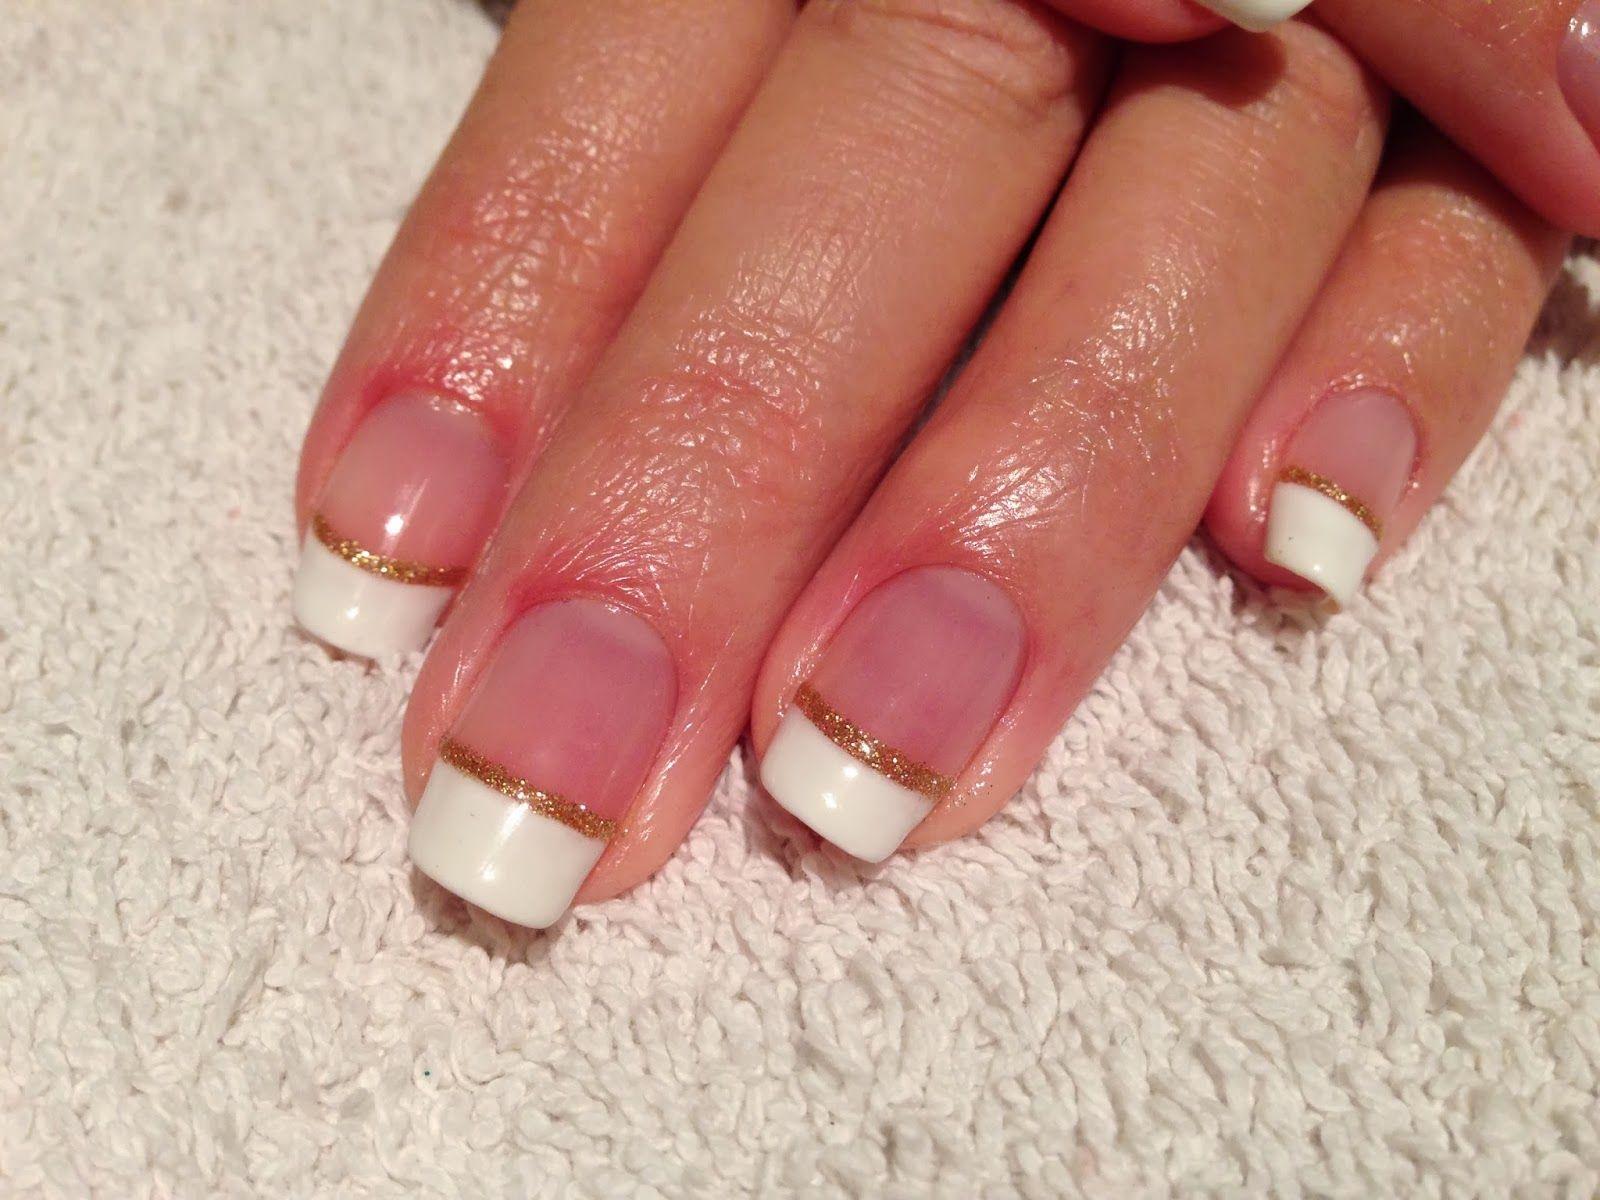 Nails 2016 Shellac Nail French Tip Designs CND Shellac French ...